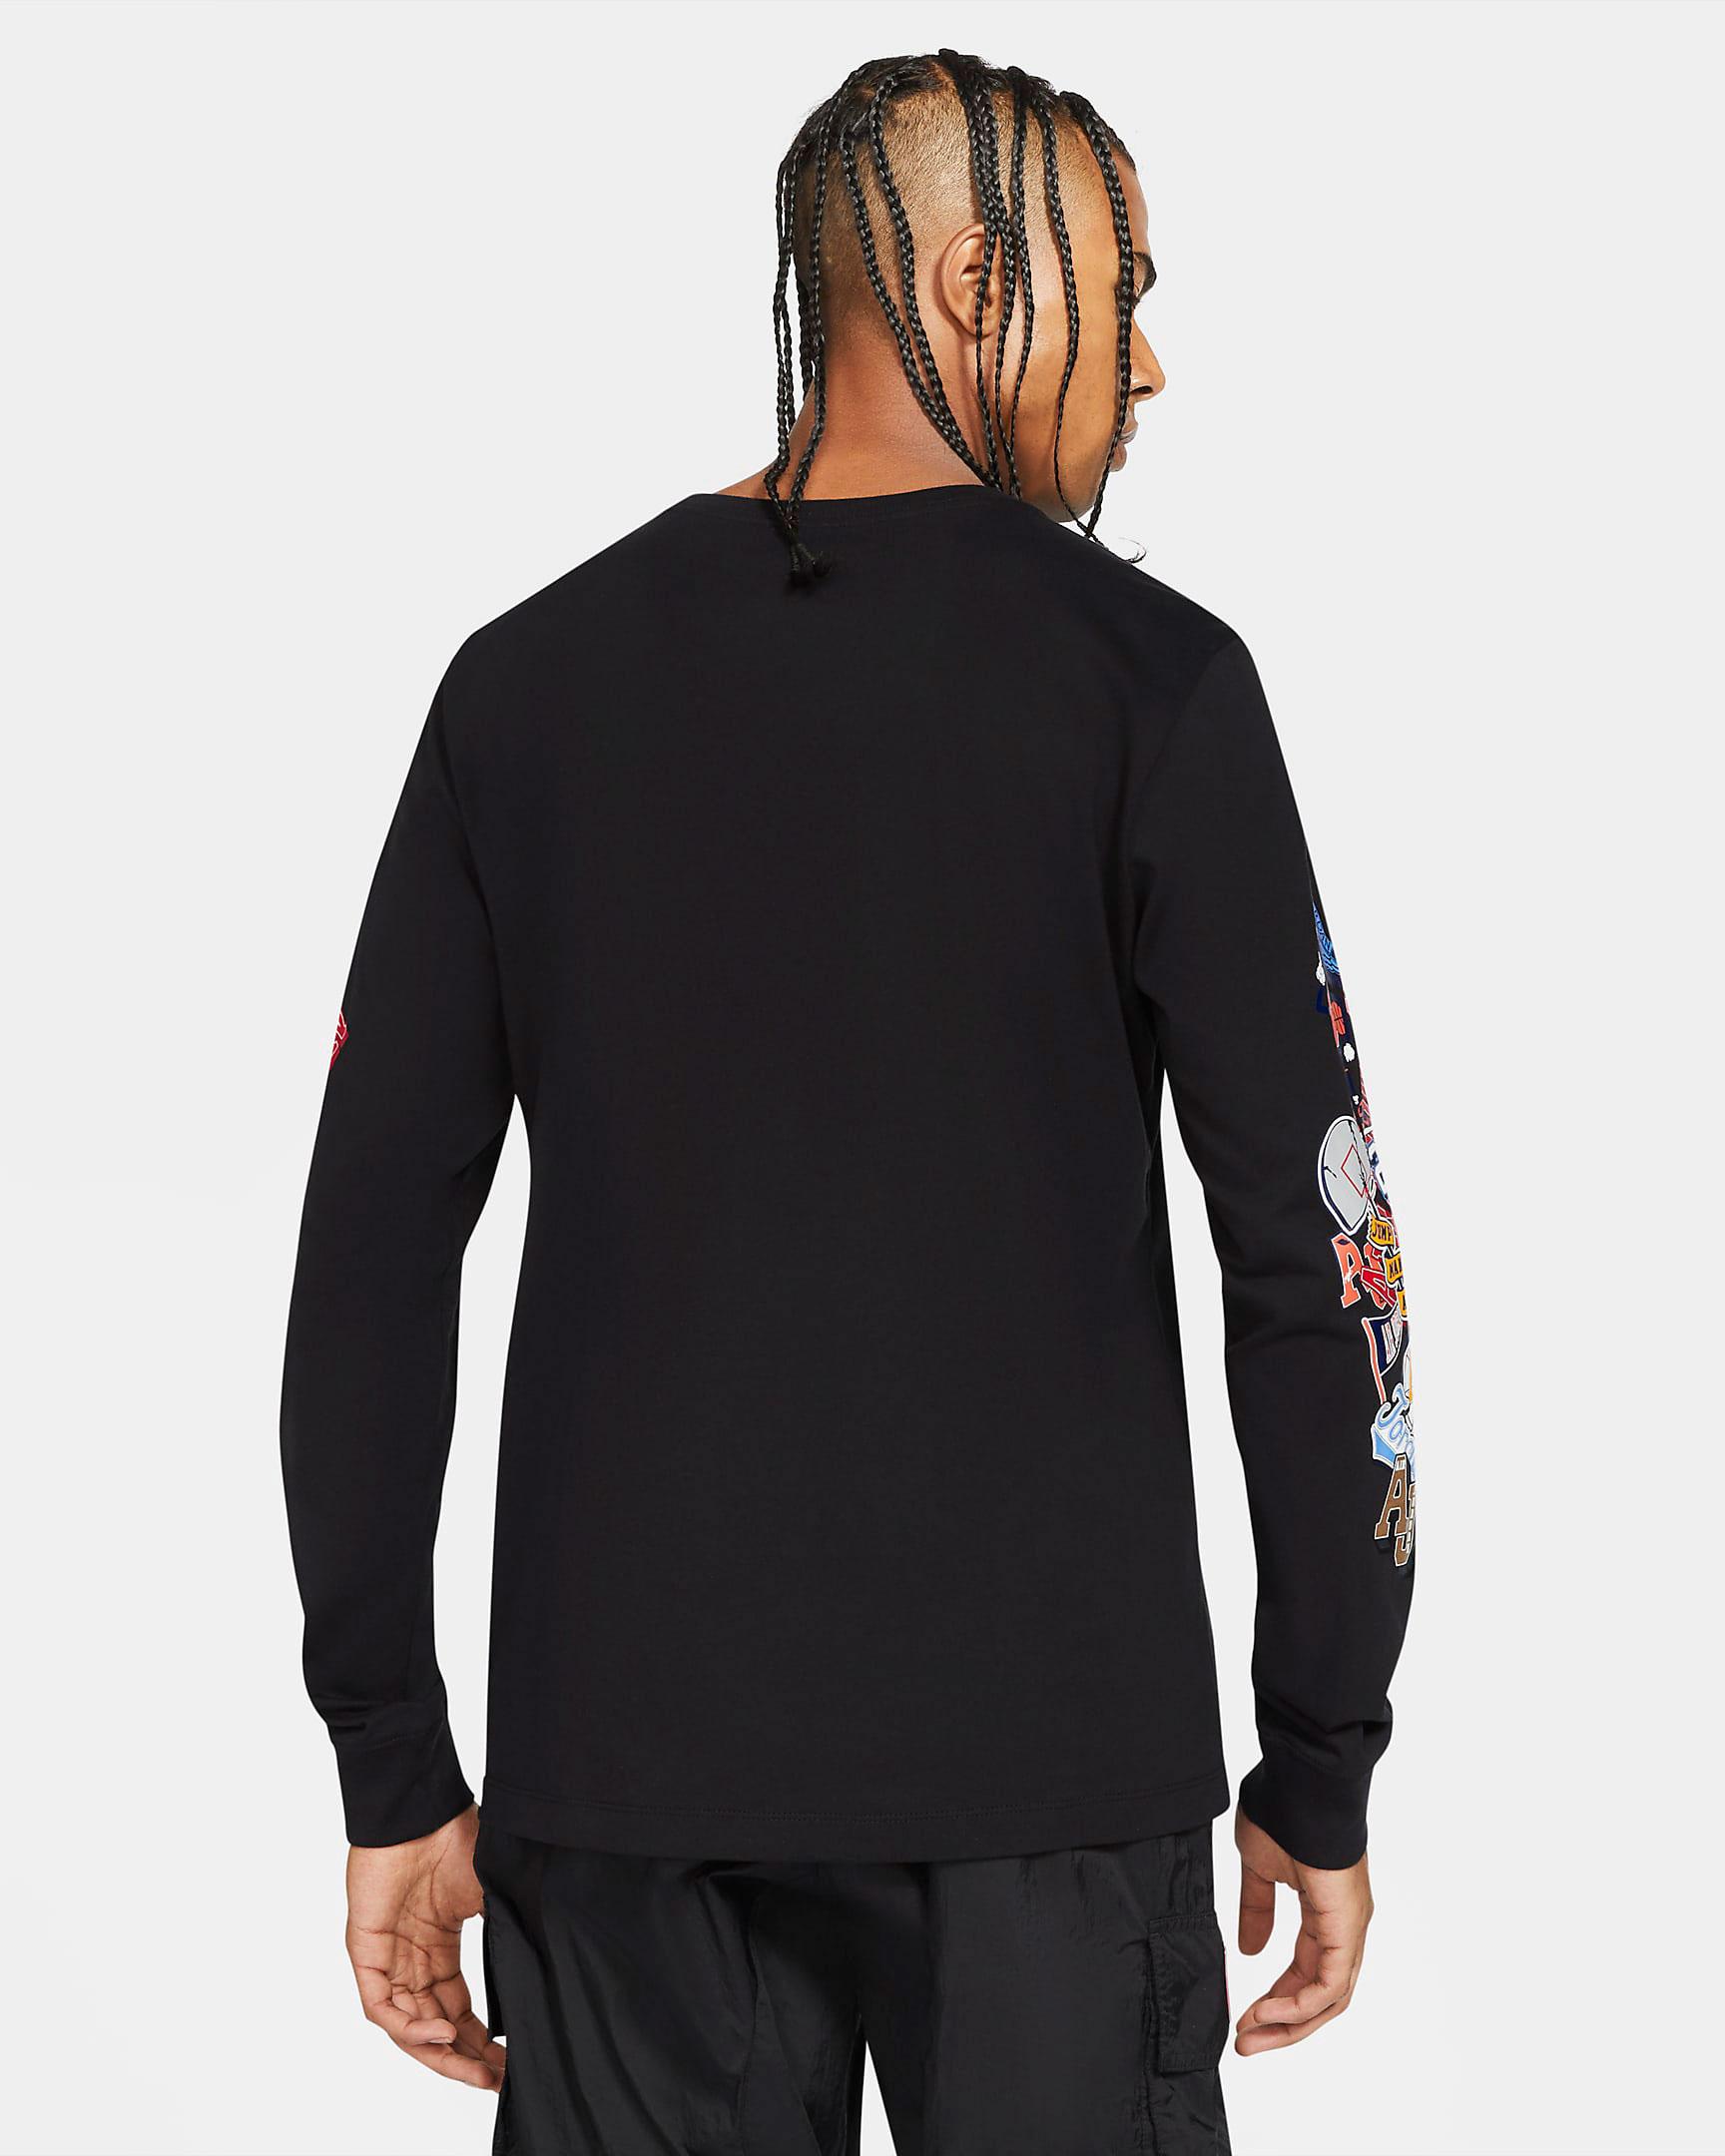 jordan-varsity-long-sleeve-shirt-black-5